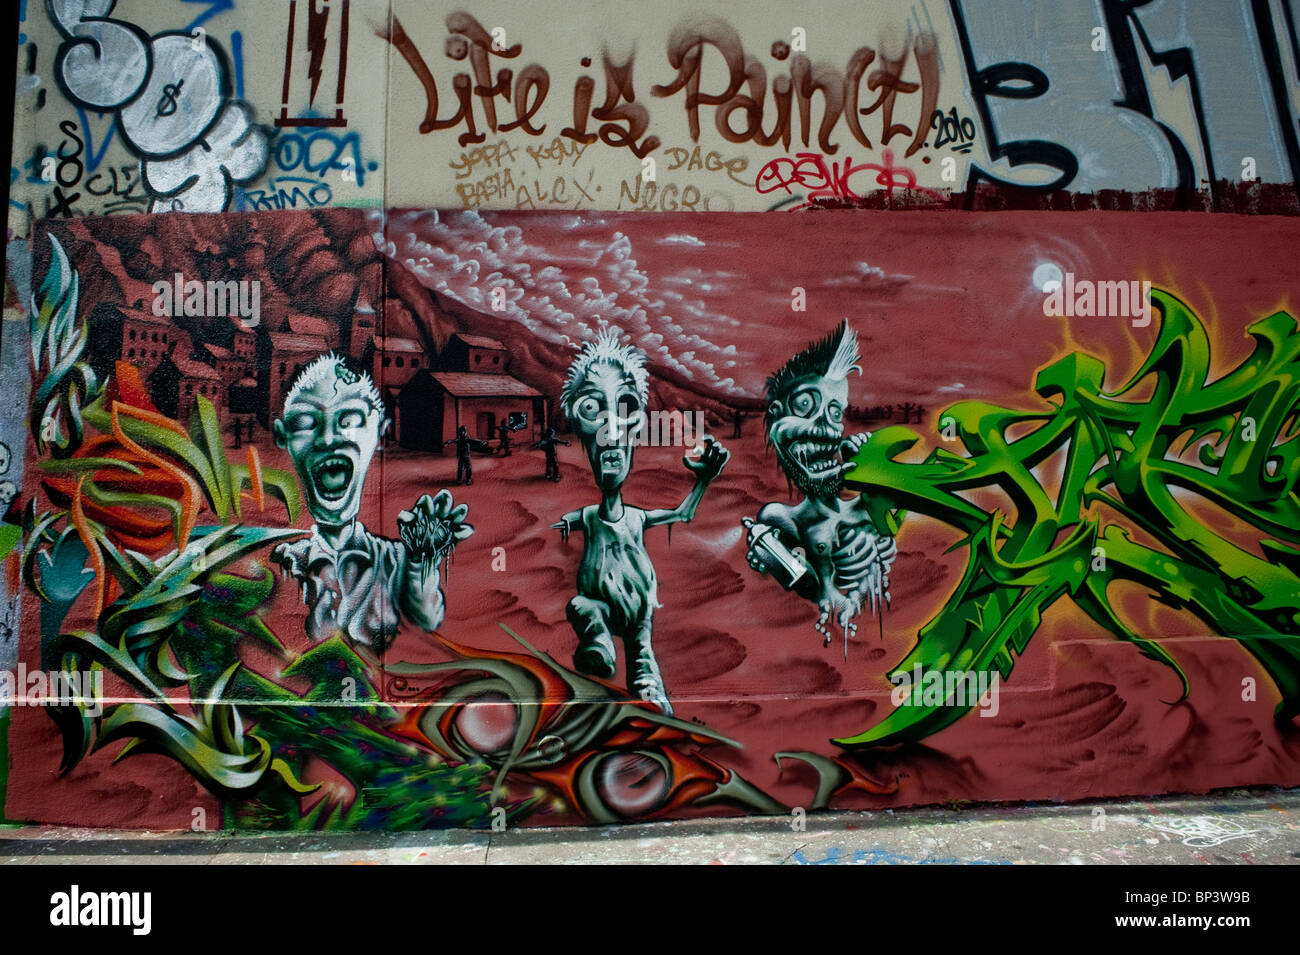 Graffiti wall painting - Paris France Painting Wall With Spray Paint Graffiti Graphic Art Street Art